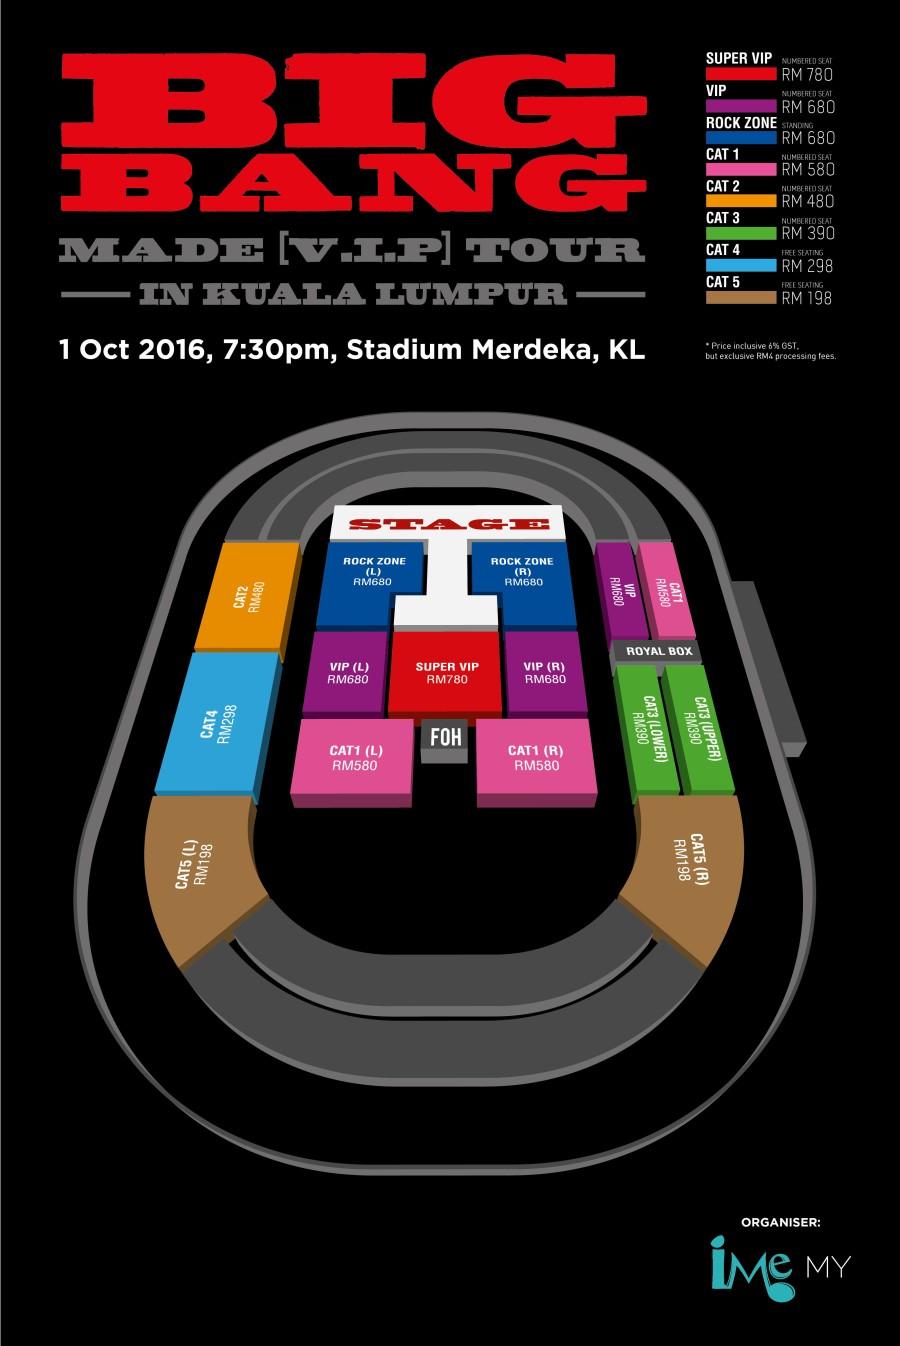 bigbang made vip tour malaysia